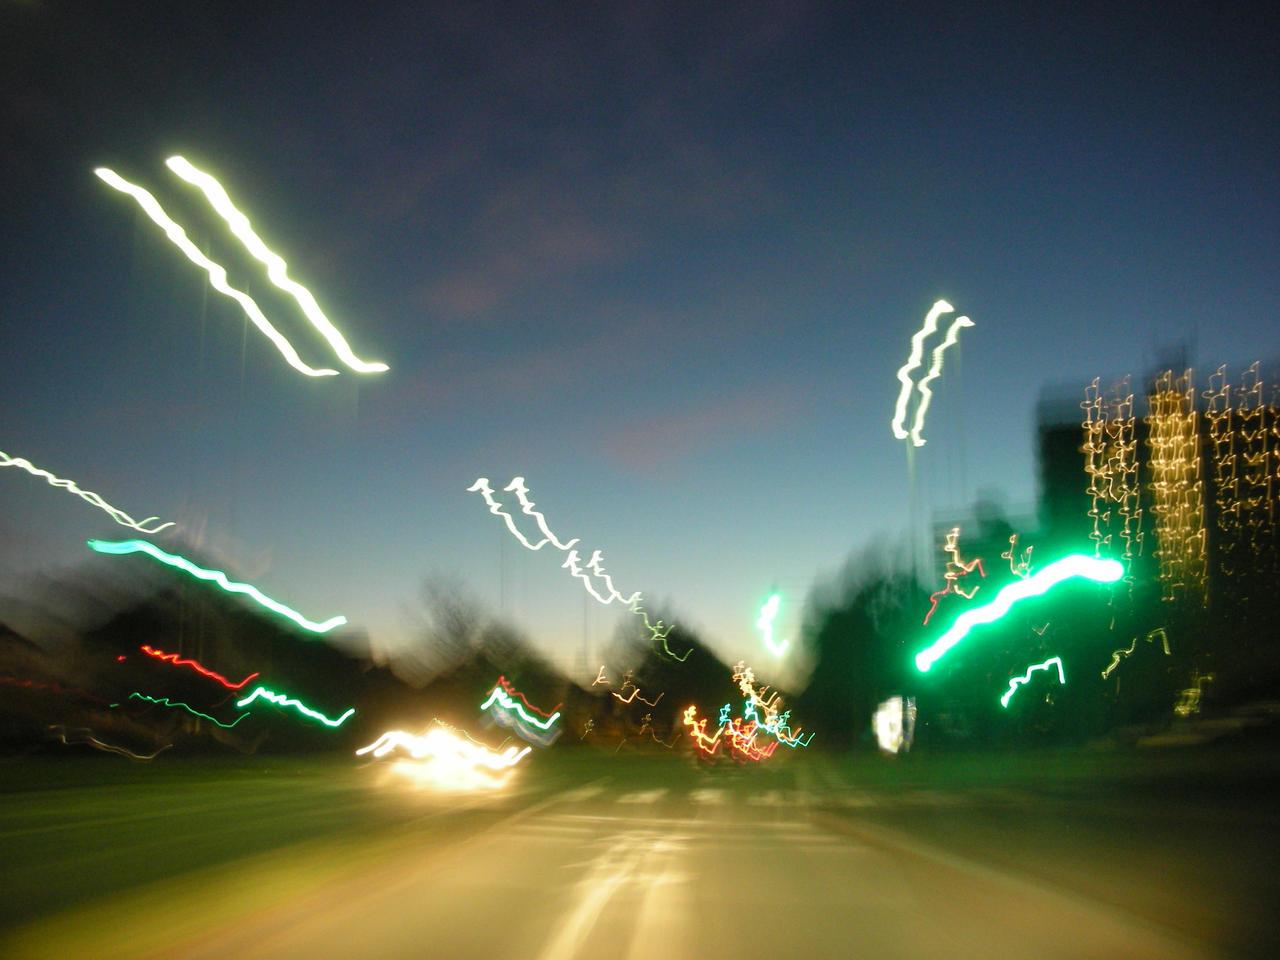 Fotografias Abstractas City_light_by_Tyrenbass